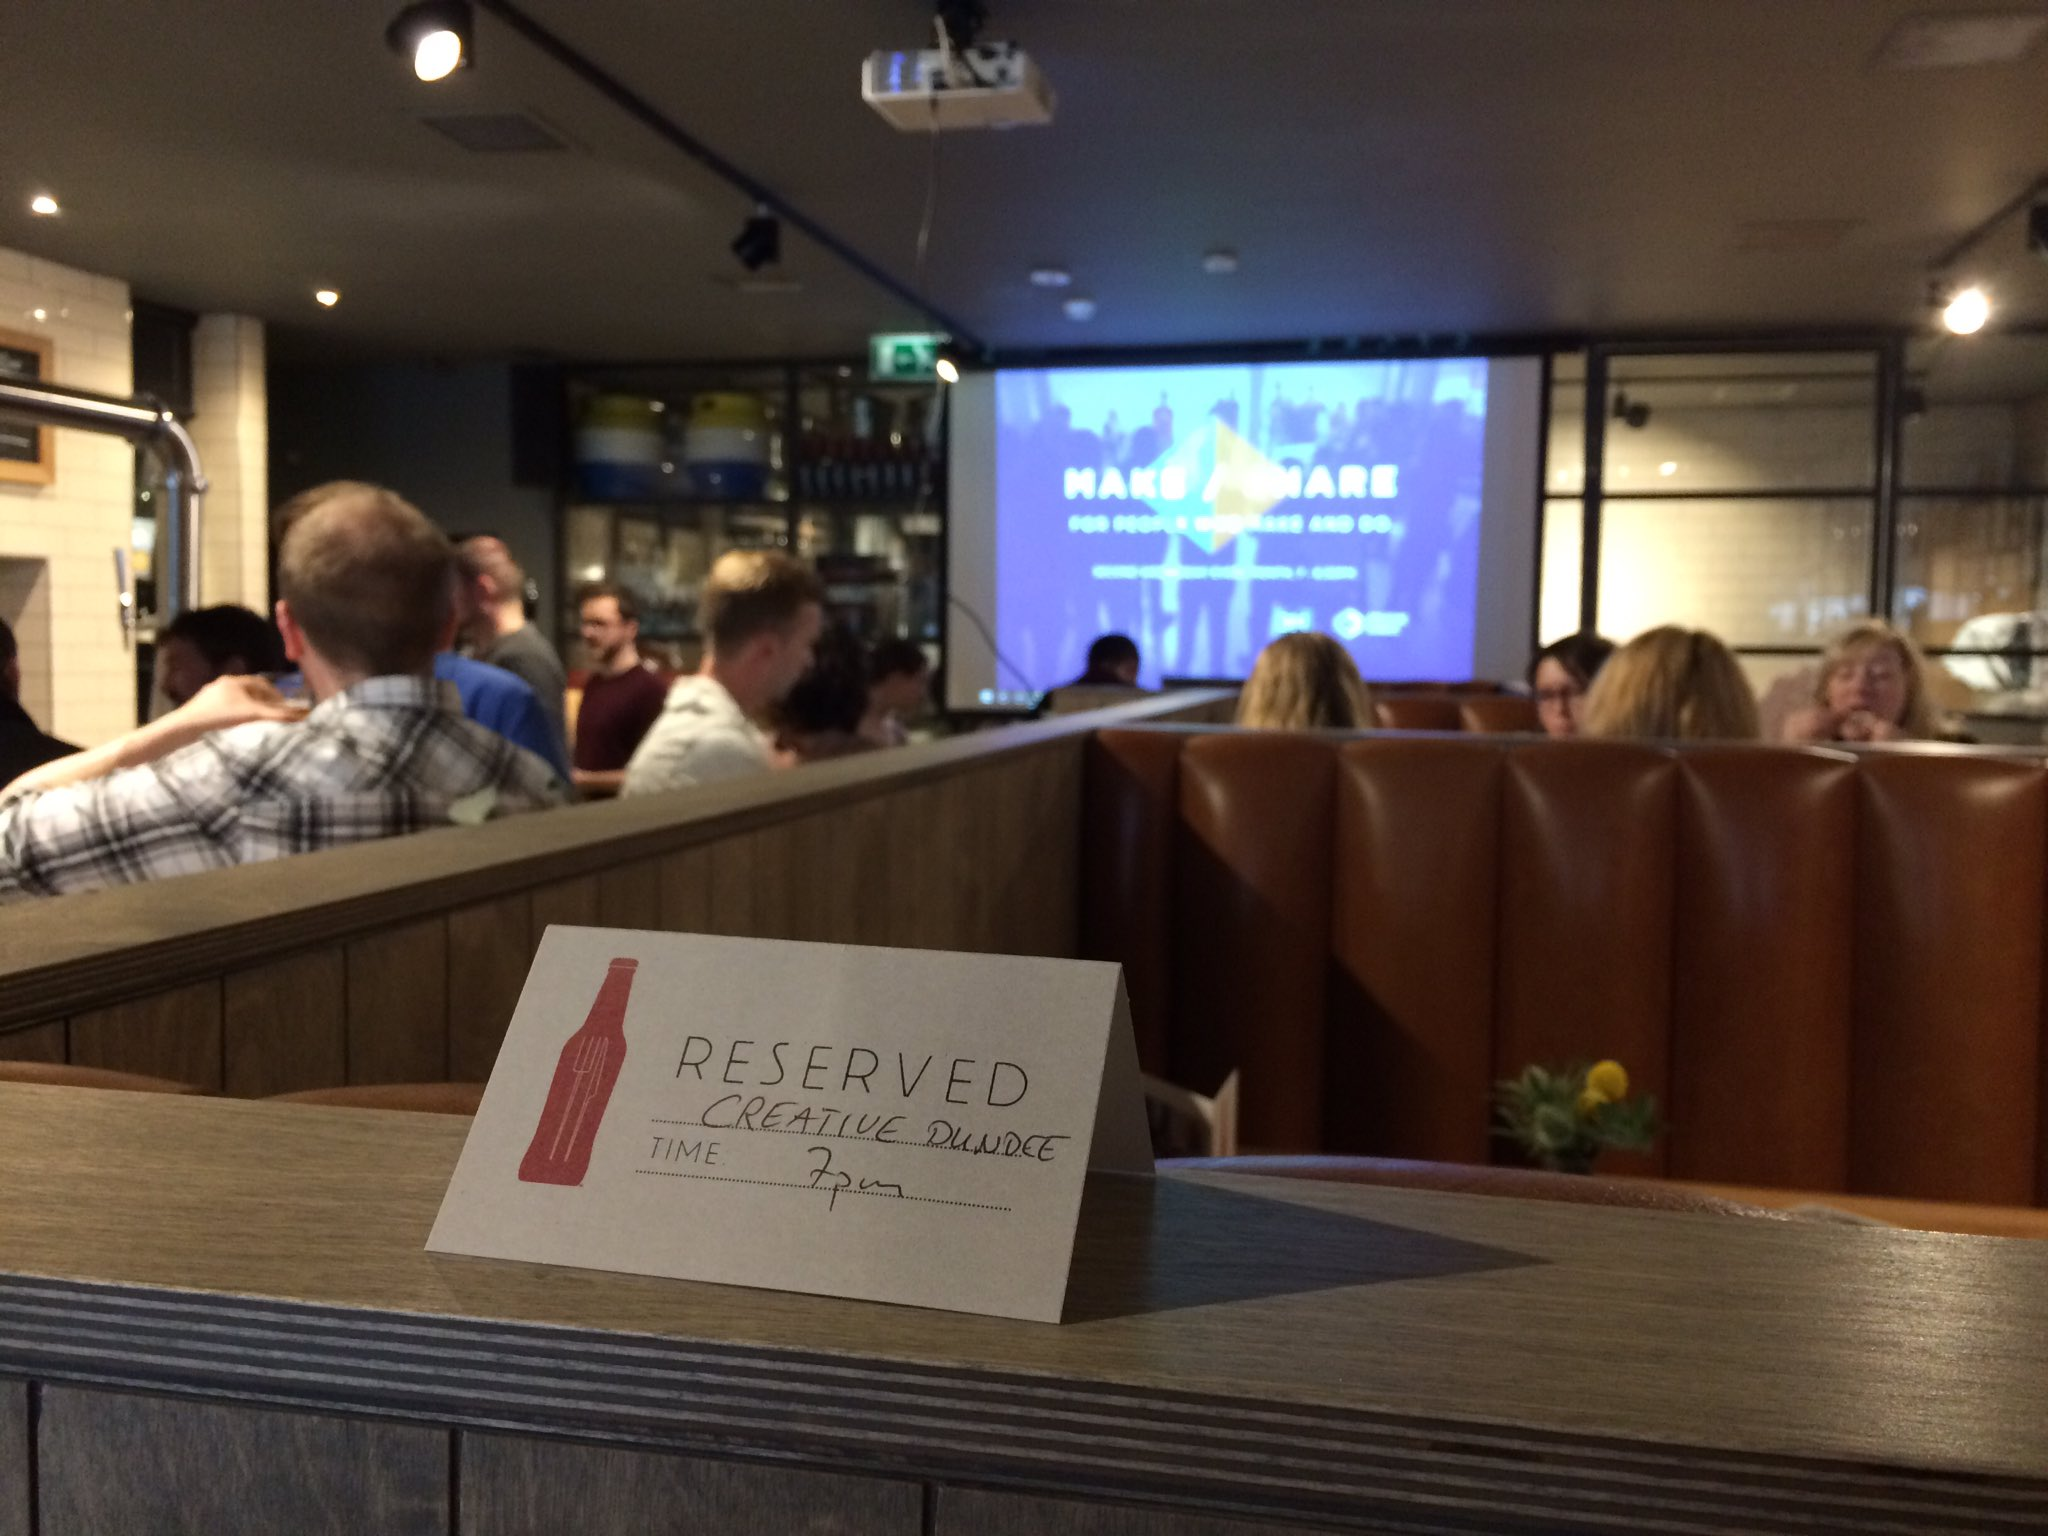 .@BeerKitchenDUN is filling up for #MakeShare tonight! Talks will start soon 😊 https://t.co/StDF0CFclN